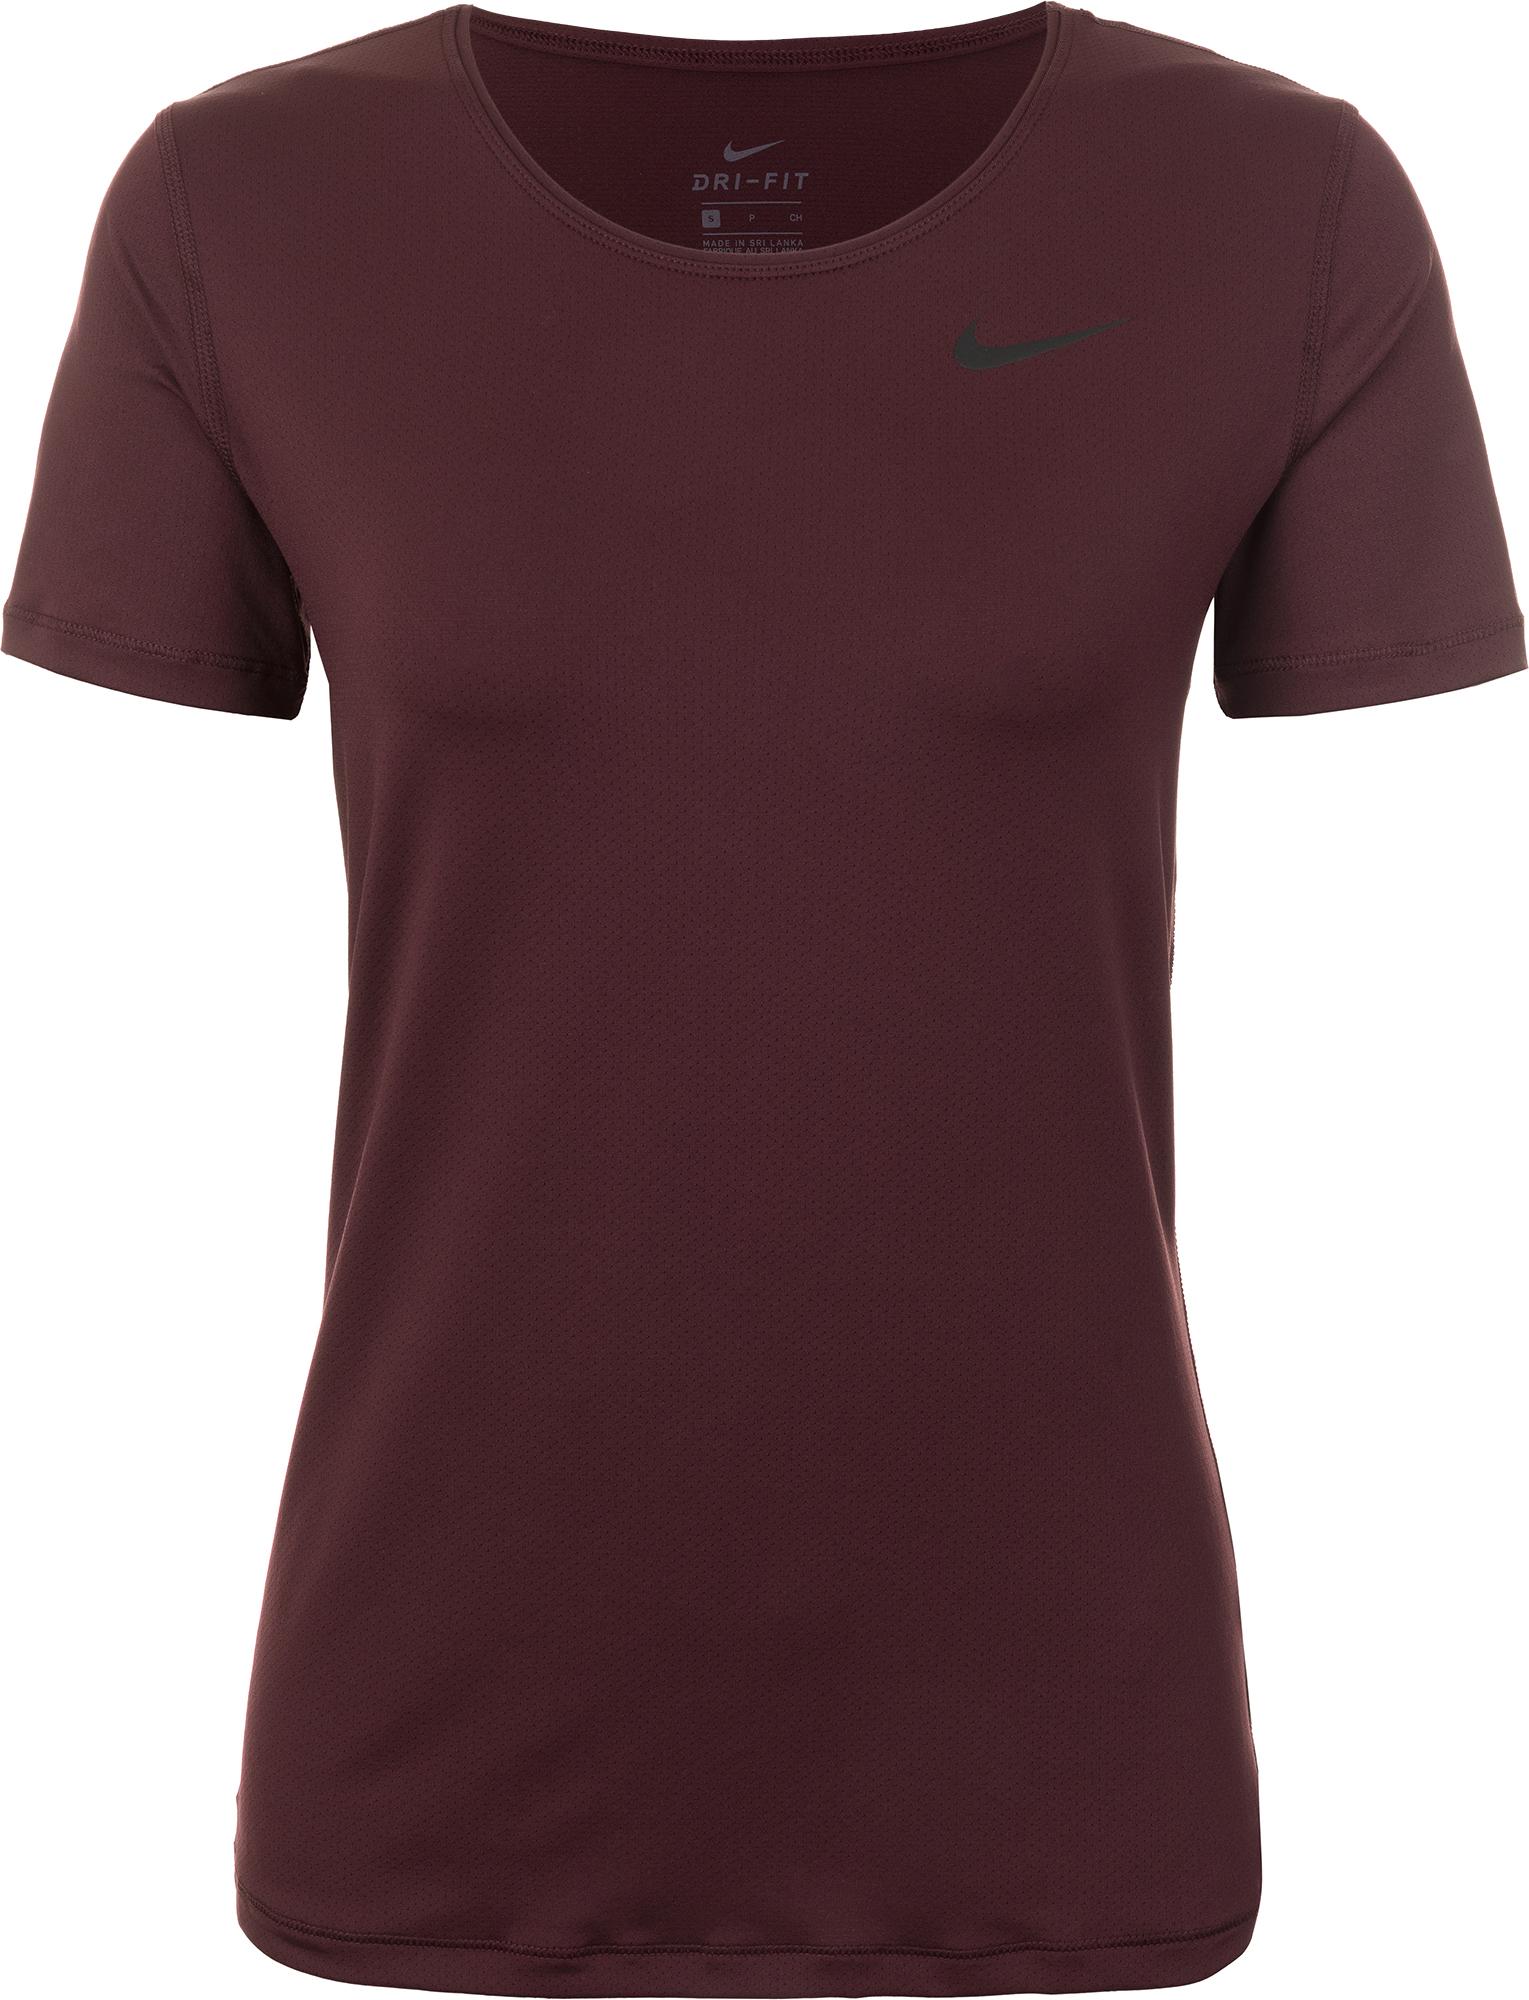 Nike Футболка женская Nike Pro, размер 48-50 футболка женская nike pro top цвет белый 889540 100 размер s 42 44